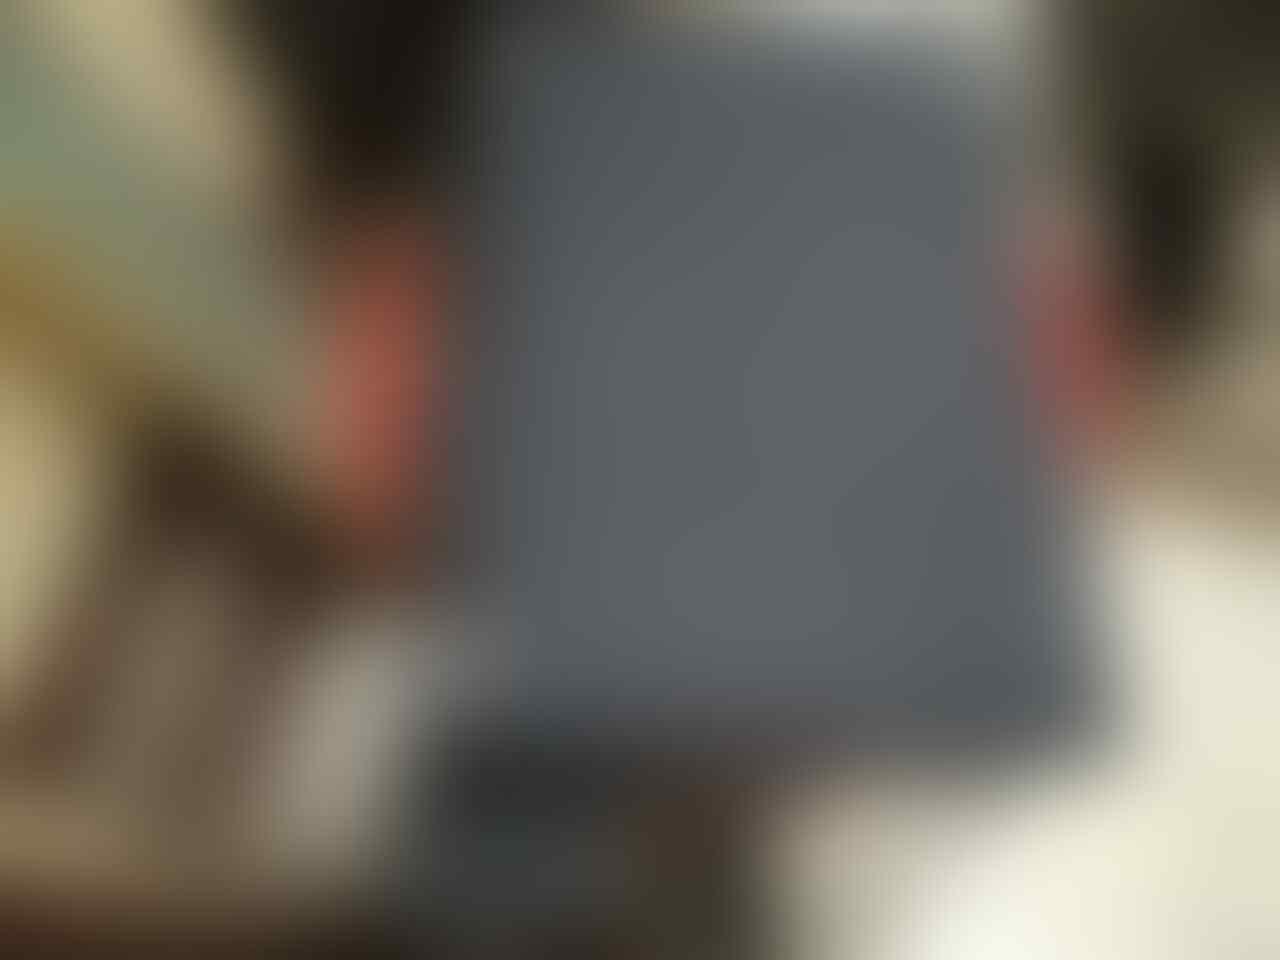 LENOVO THINKPAD T420 i5 2520M 2.5GHZ|500GB HDD|4GB RAM|DOCKING|9 CELL|MULUS&MURAH!